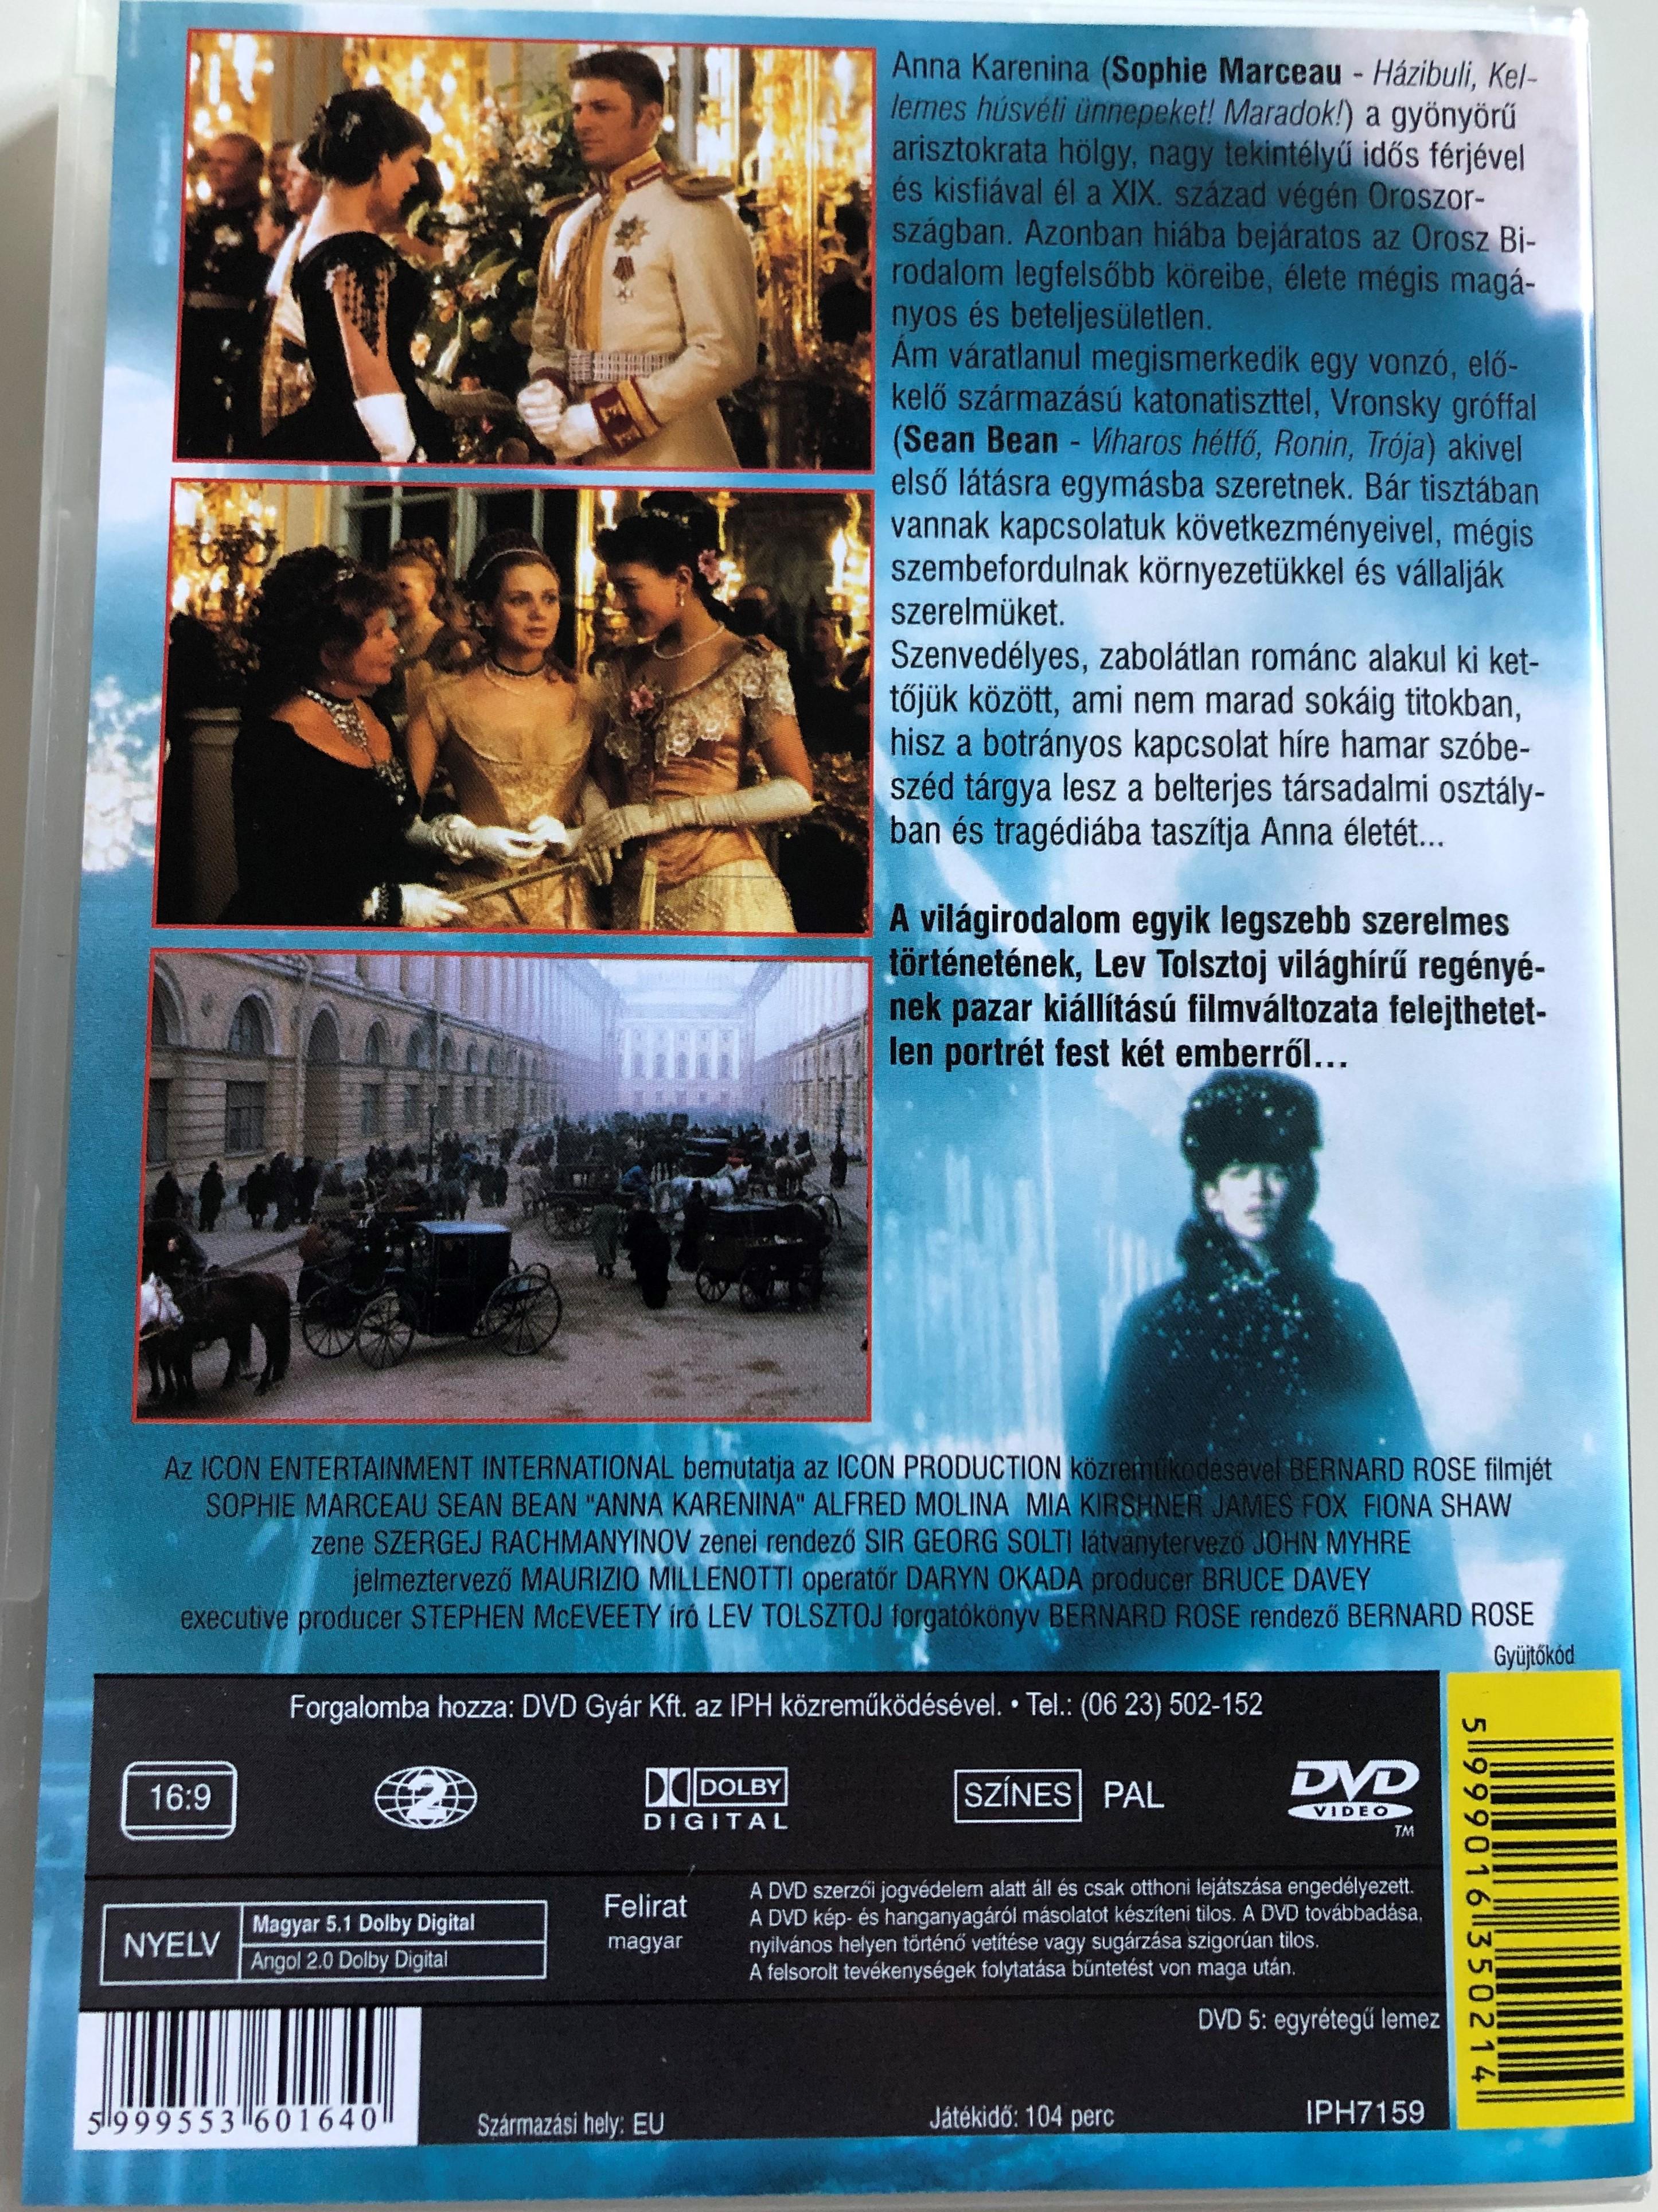 anna-karenina-dvd-1997-directed-by-bernard-rose-starring-sophie-marceau-sean-bean-lev-tolstoy-s-classic-novel-film-adaptation-2-.jpg